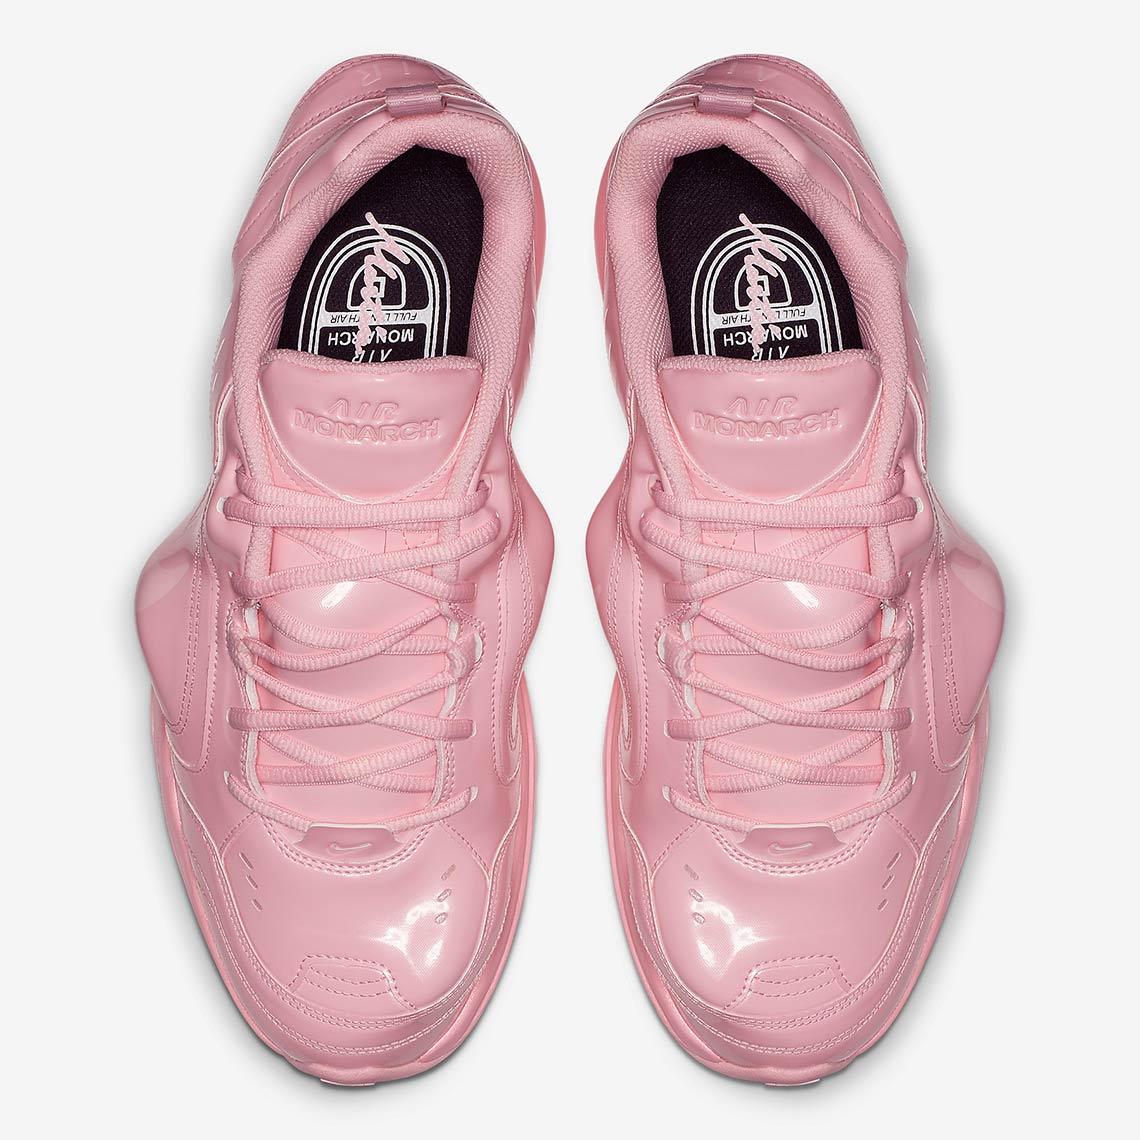 Martine Rose Nike Air Monarch Pink Release Date